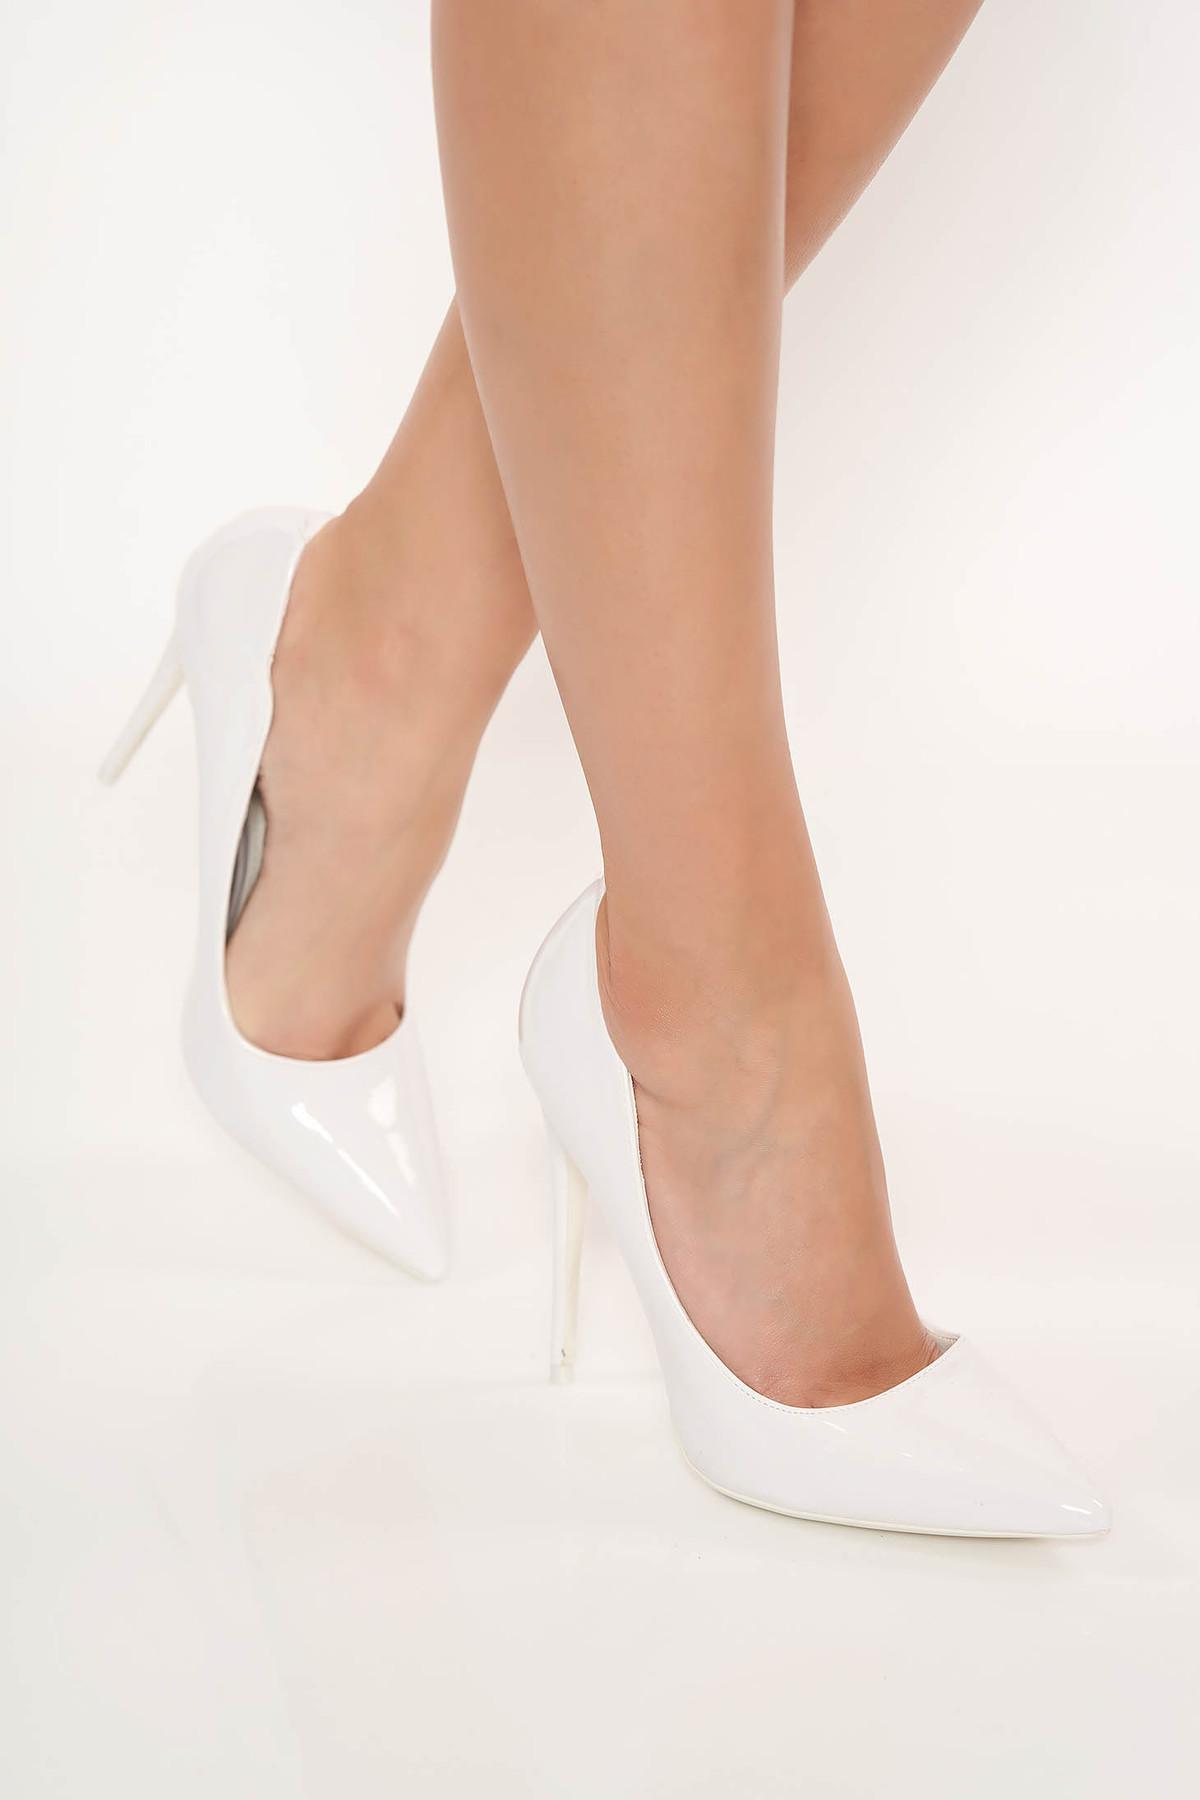 Pantofi alb cu toc inalt elegant din piele ecologica lacuita cu varful usor ascutit